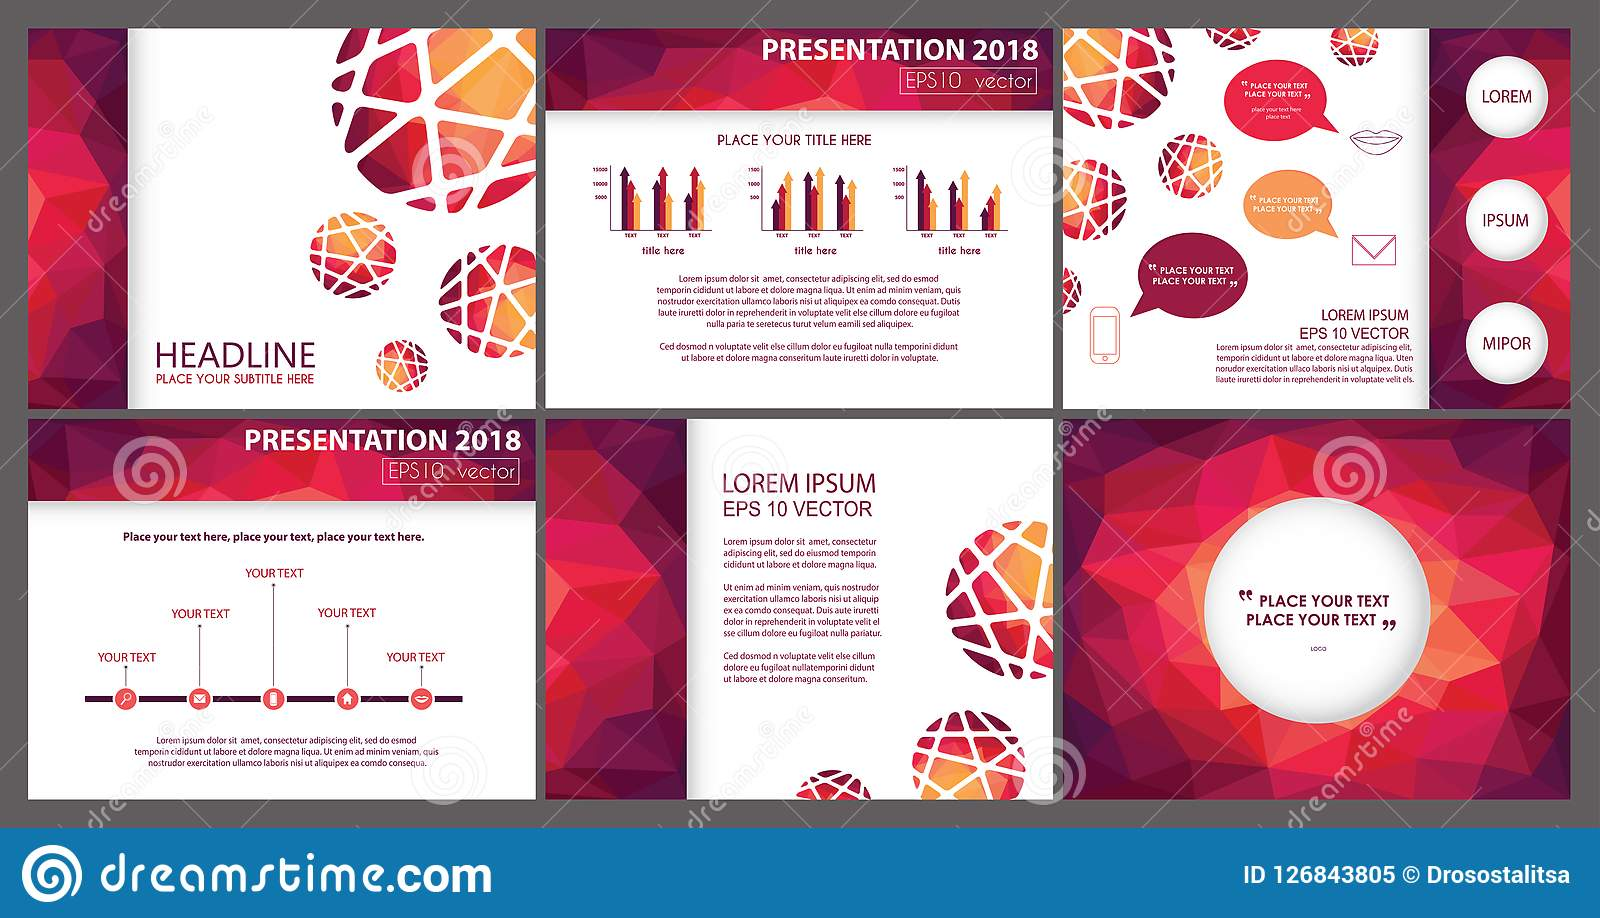 Bright Fuchsia Feminine Polygonal Powerpoint Presentation Template Stock Vector Illustration Of Polygonal Business 126843805